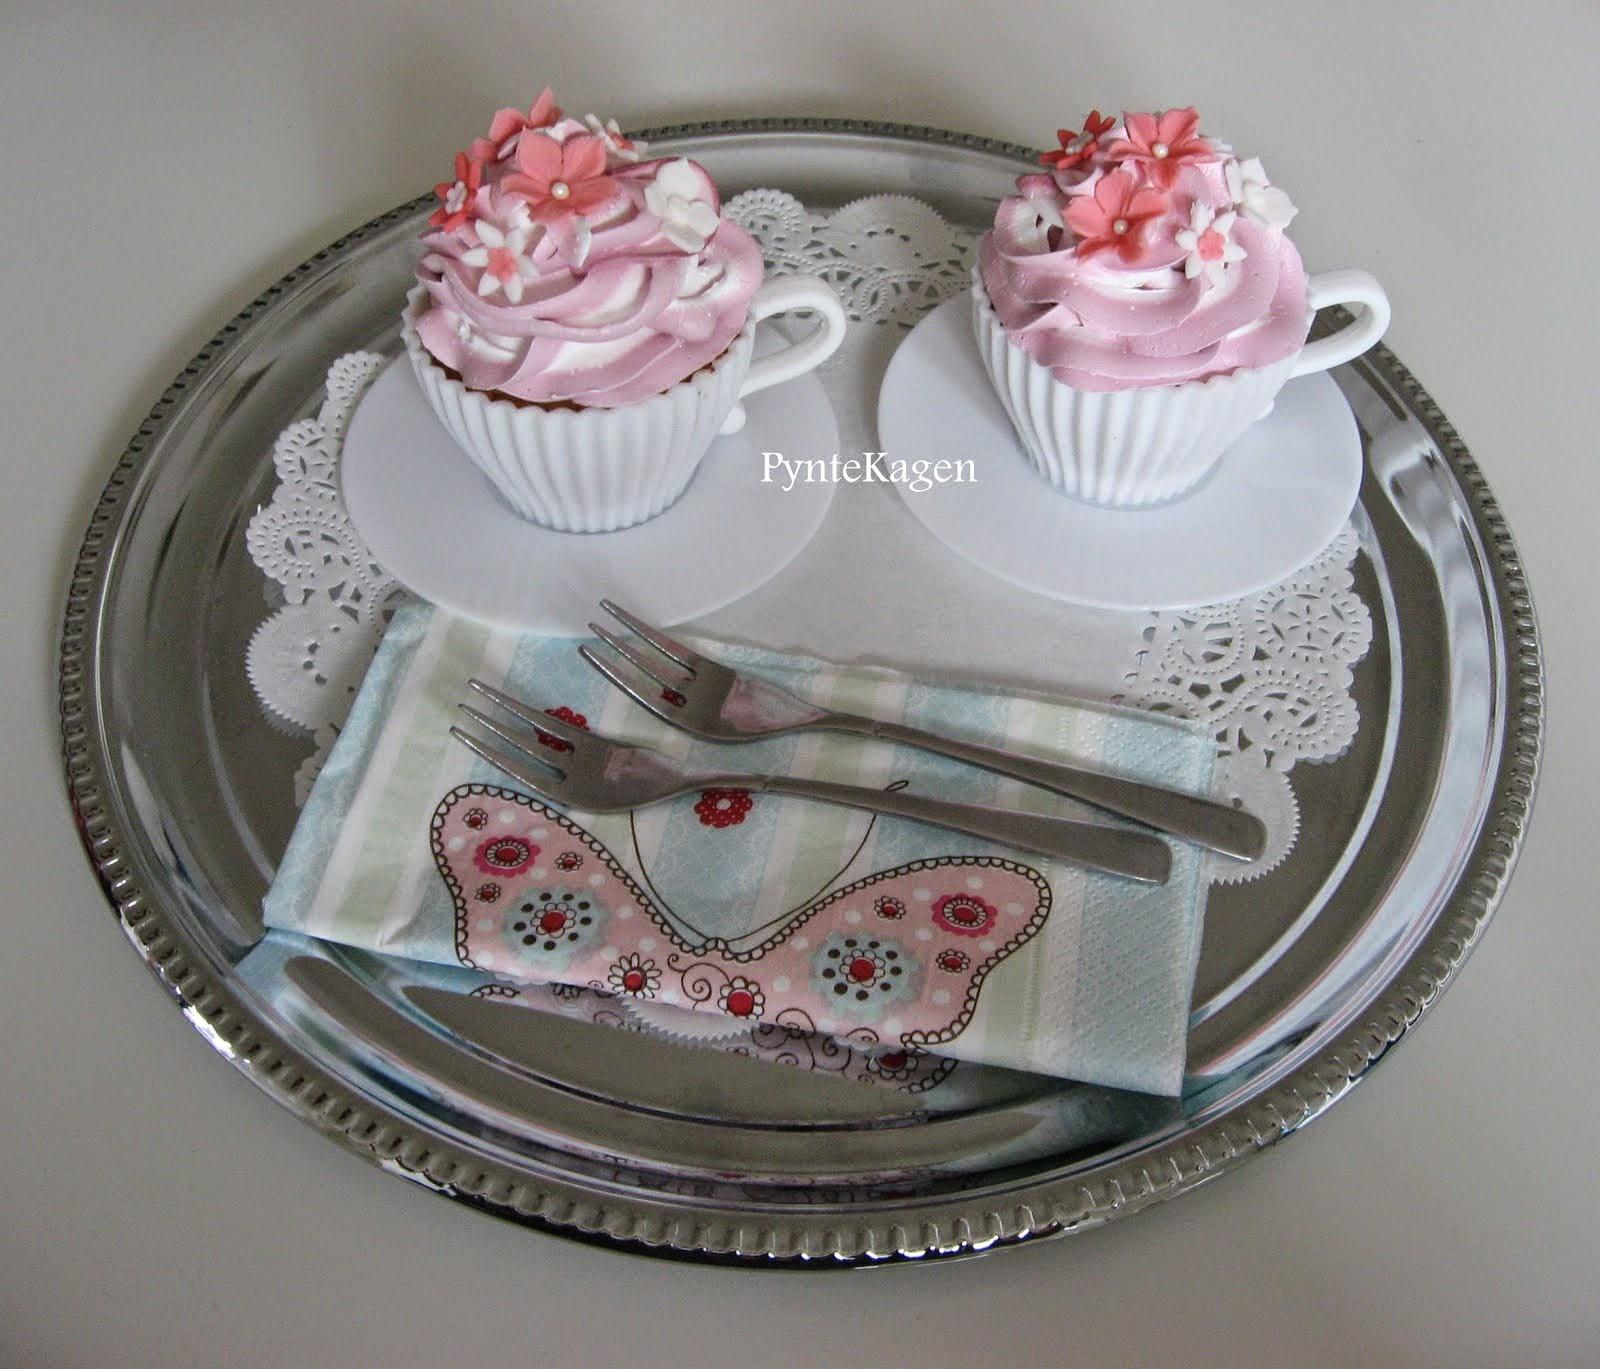 Sommercupcakes